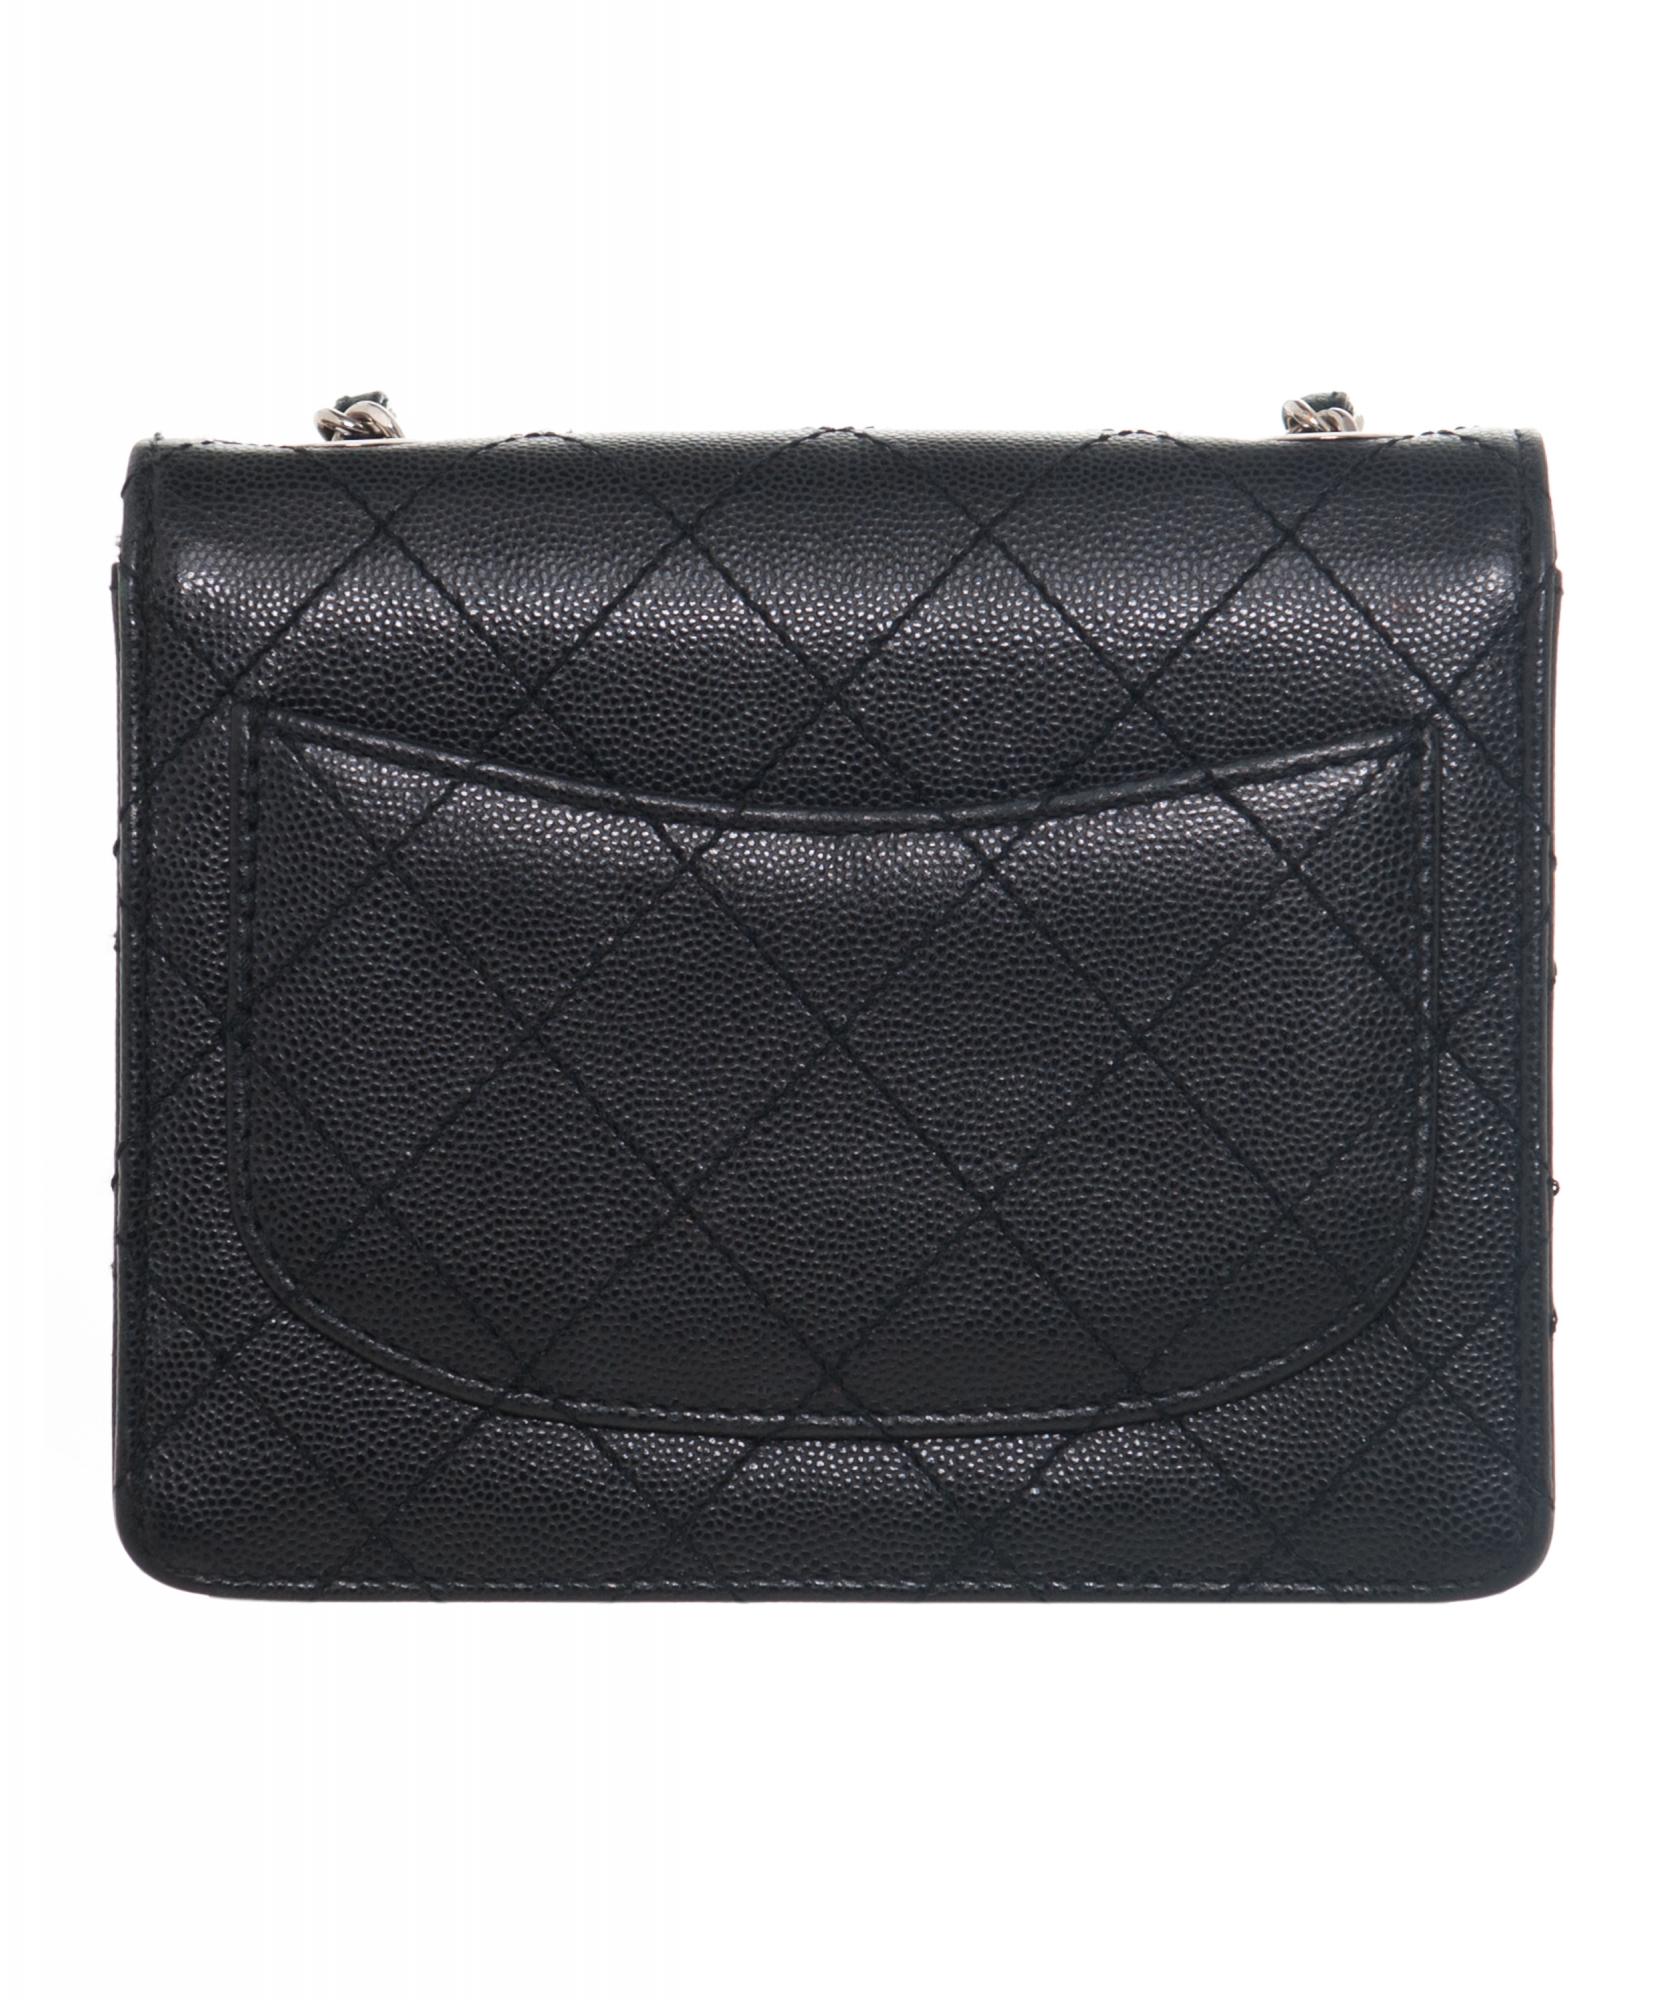 Chanel Vintage Black Caviar Quilted Mini Flap Bag  31182b2952503